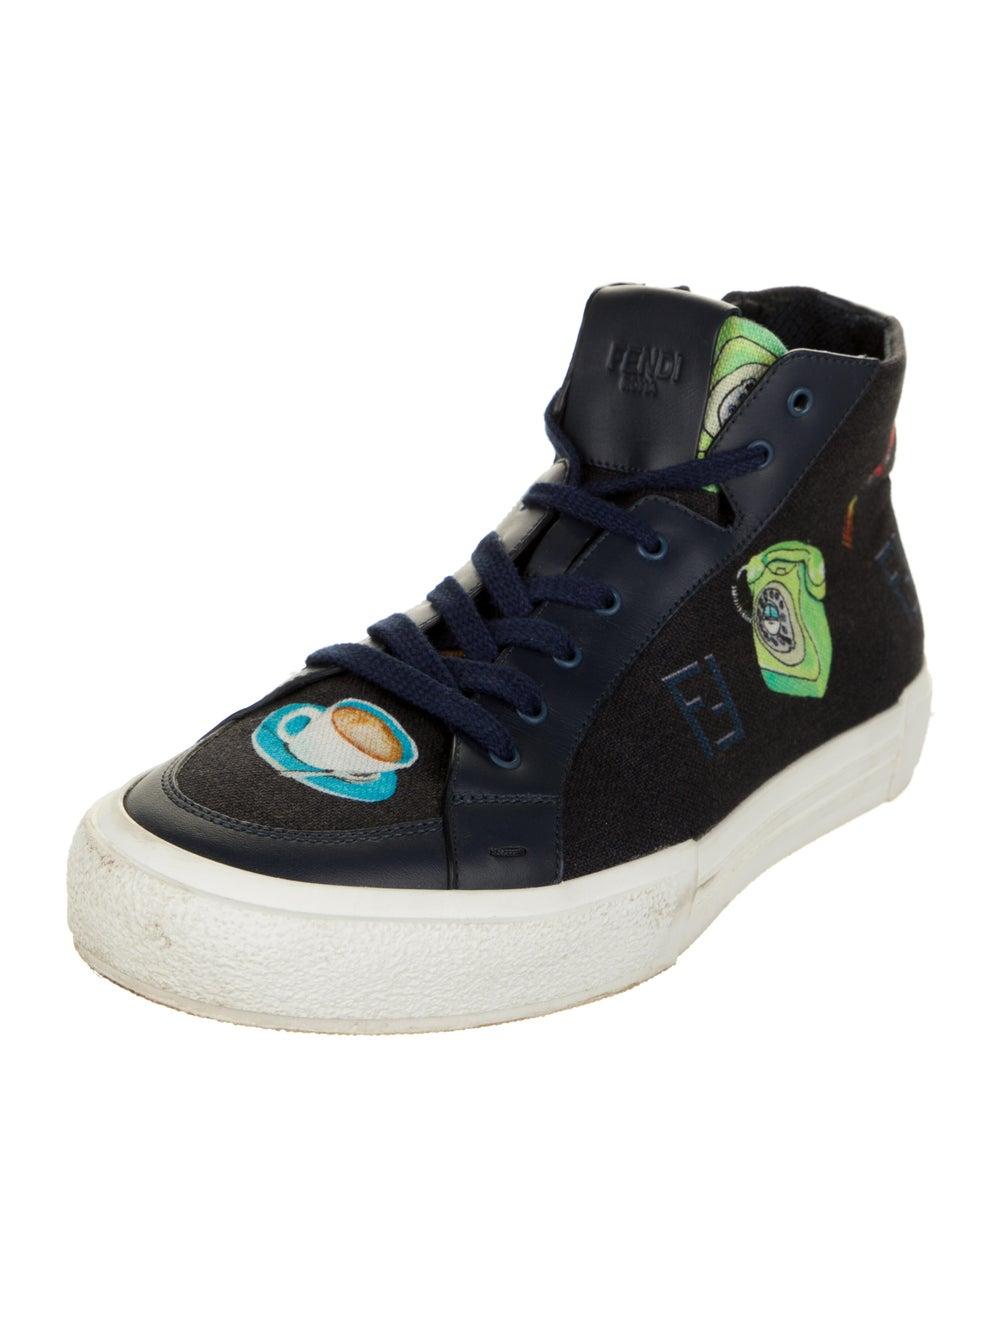 Fendi Graphic Print Sneakers Blue - image 2